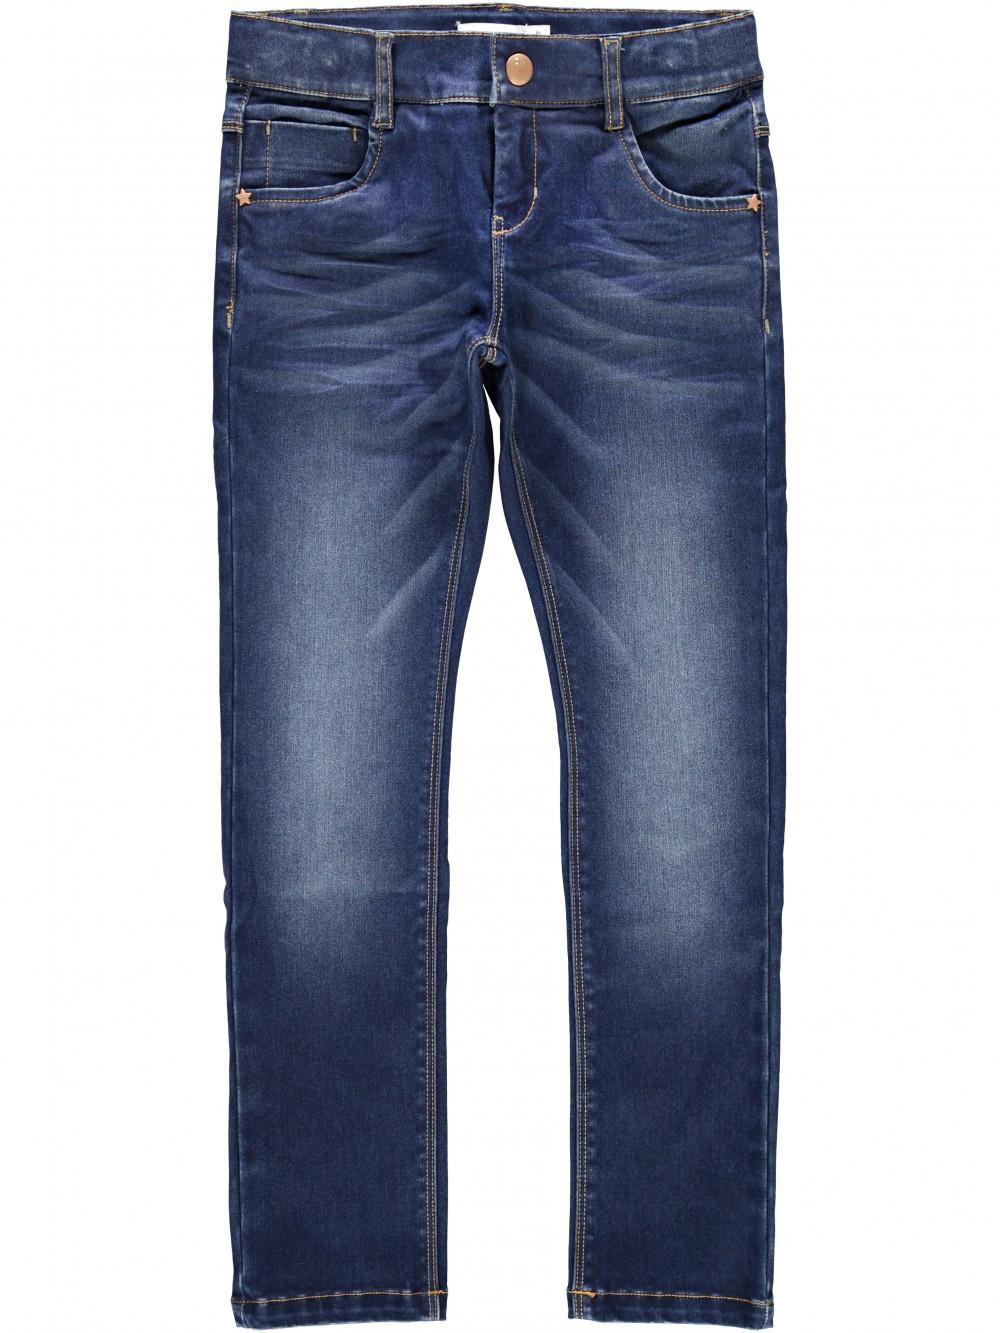 Blå jeans til jente, Tatiana denim